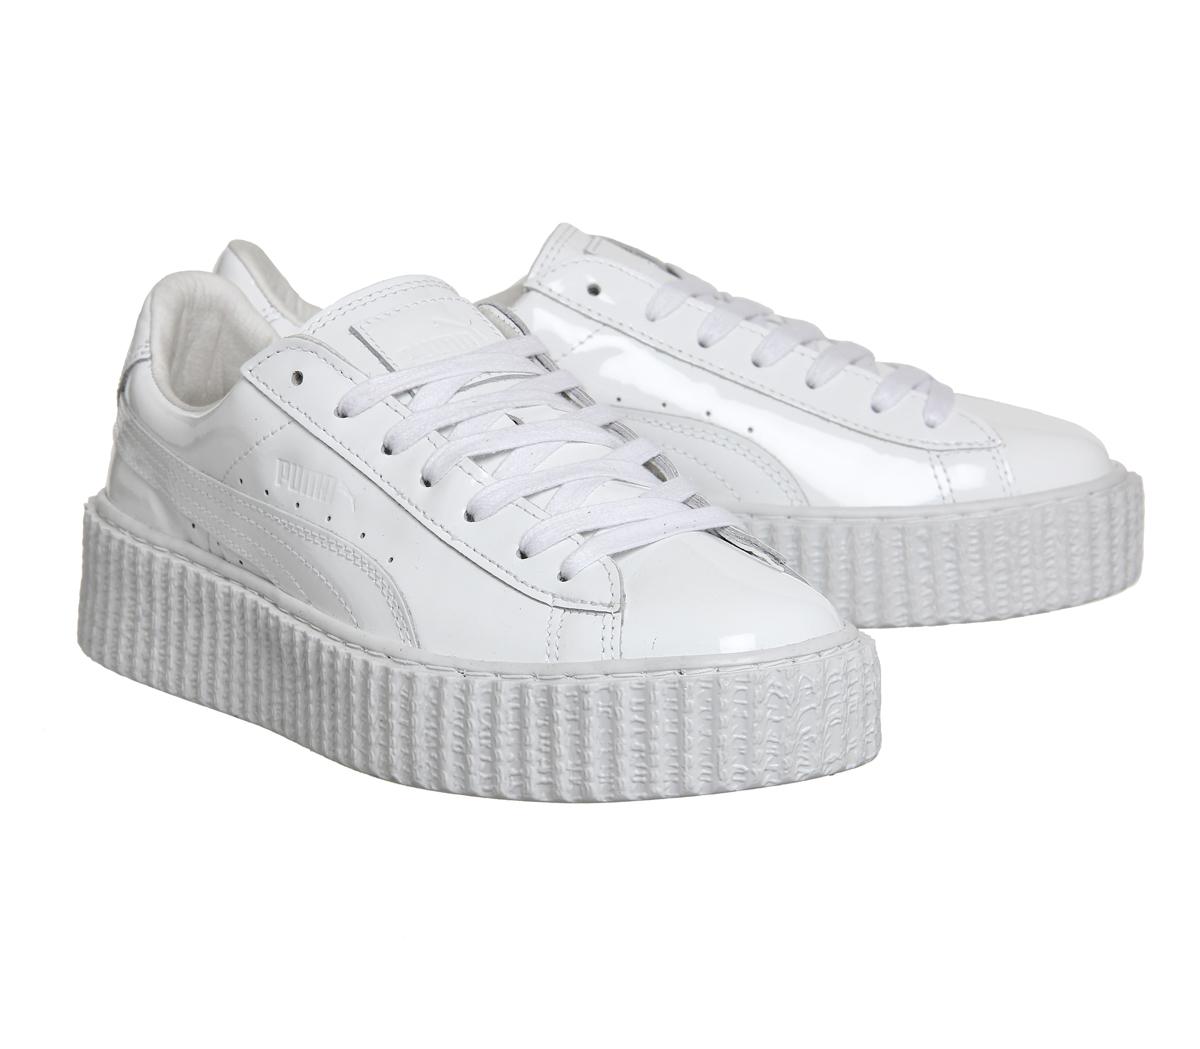 8e39d053087002 Puma Basket Creepers in White